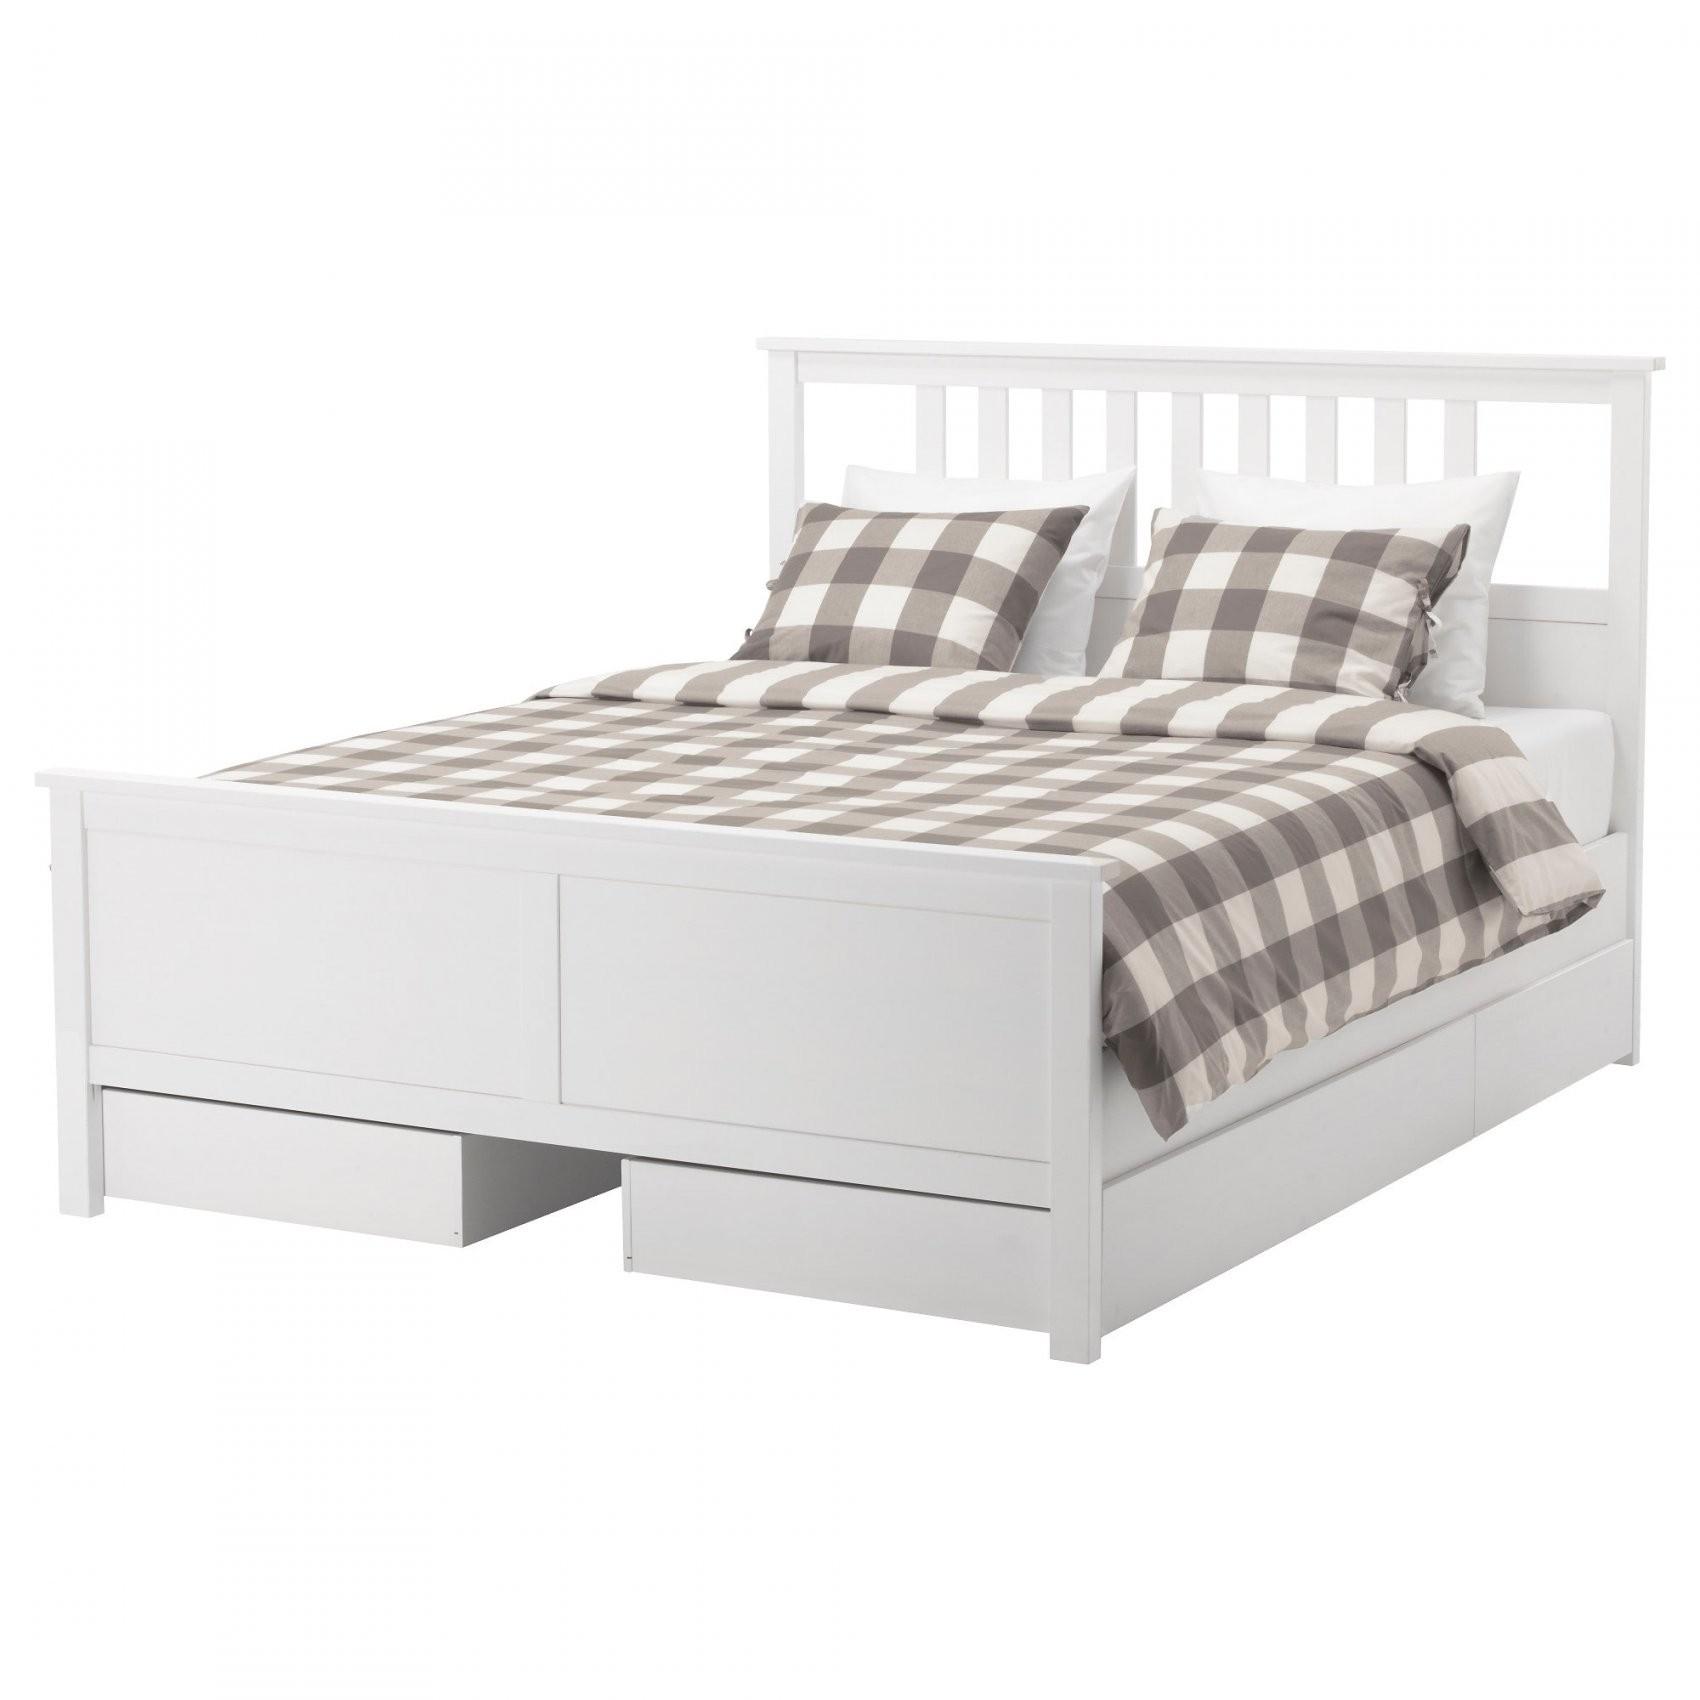 Hemnes Bedframe Met 4 Bedlades  140X200 Cm  Witgebeitst  Ikea von Ikea Hemnes Bett 160X200 Photo